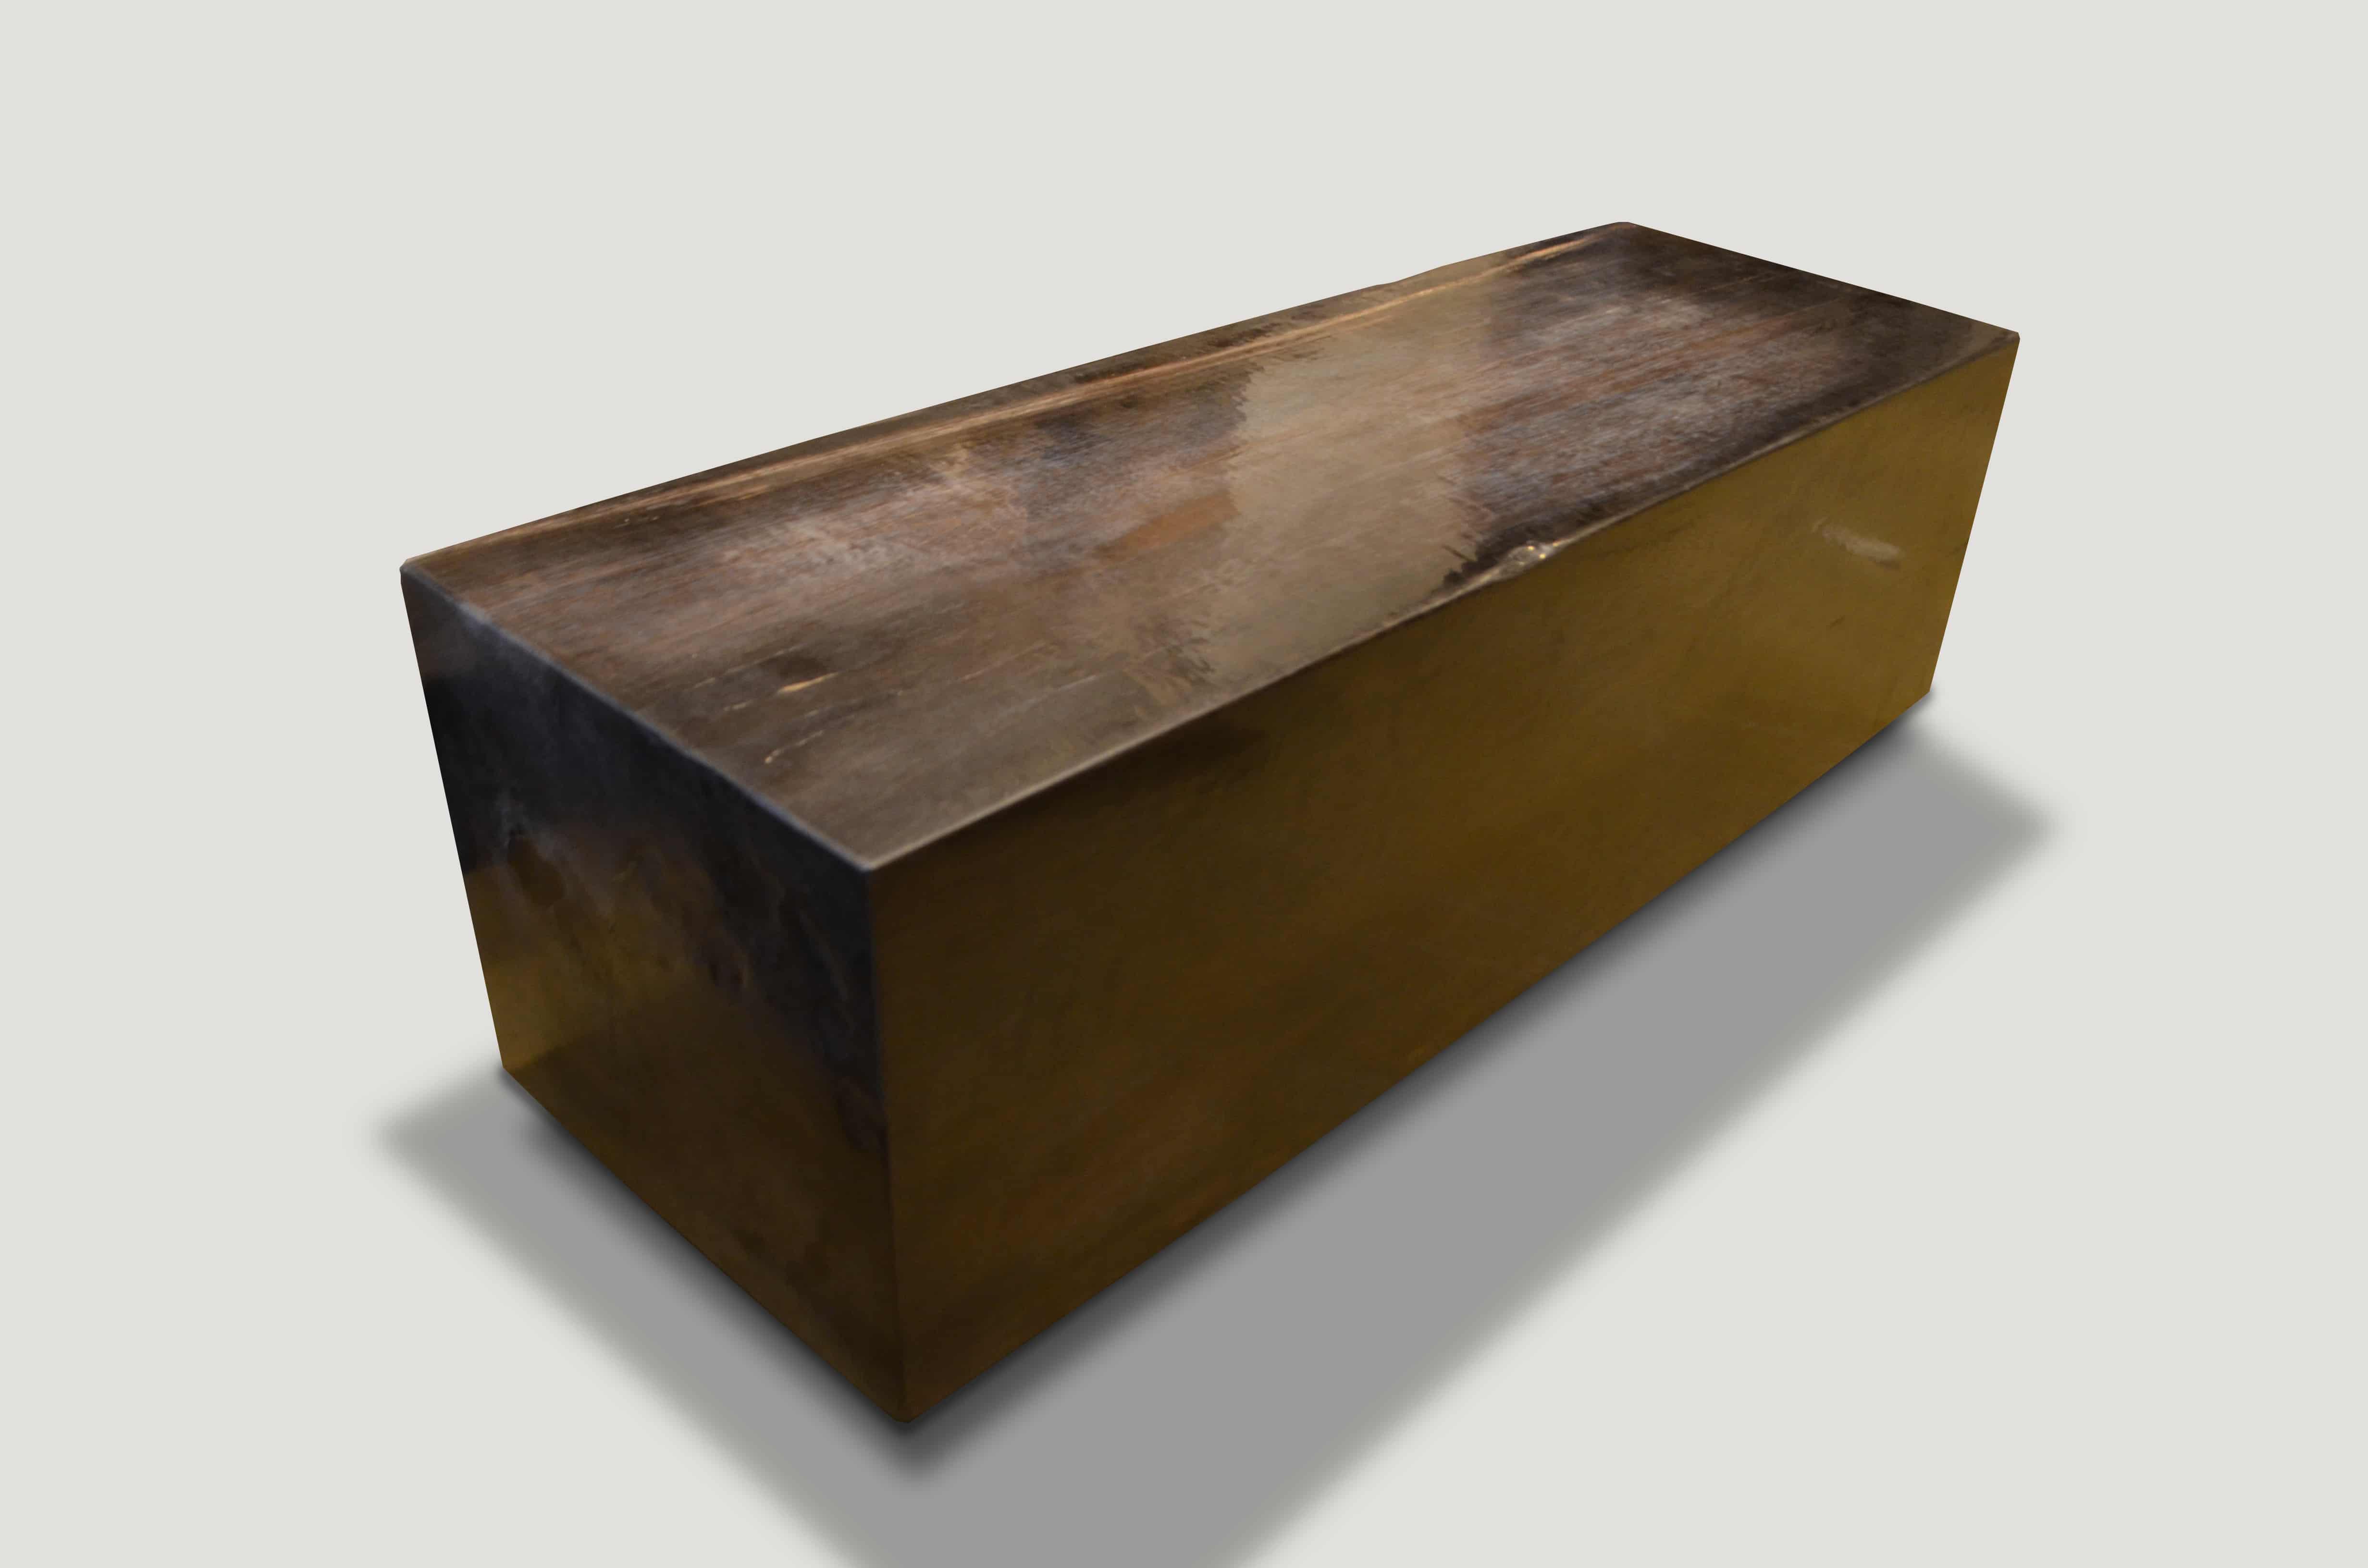 Super Smooth Petrified Wood Log Bench 1343F - Andrianna Shamaris